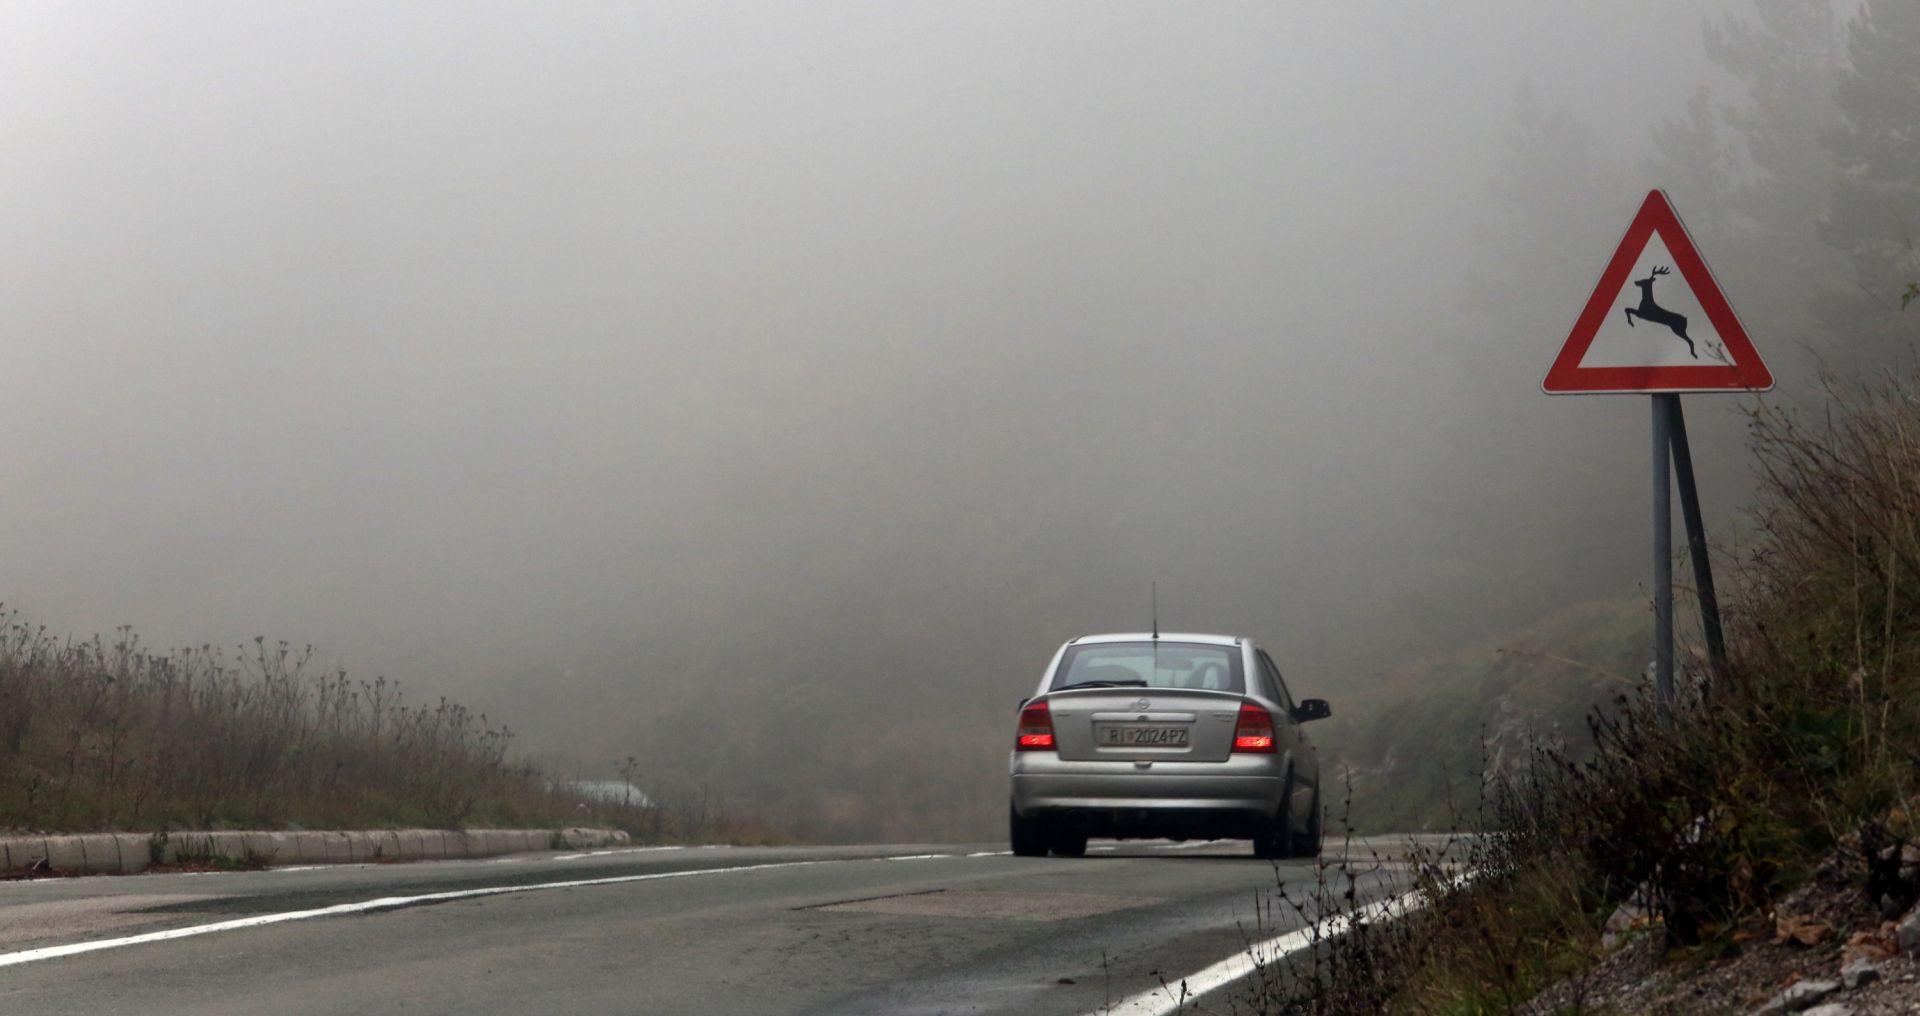 HAK Kolnici mokri i skliski, magla smanjuje vidljivost i usporava vožnju